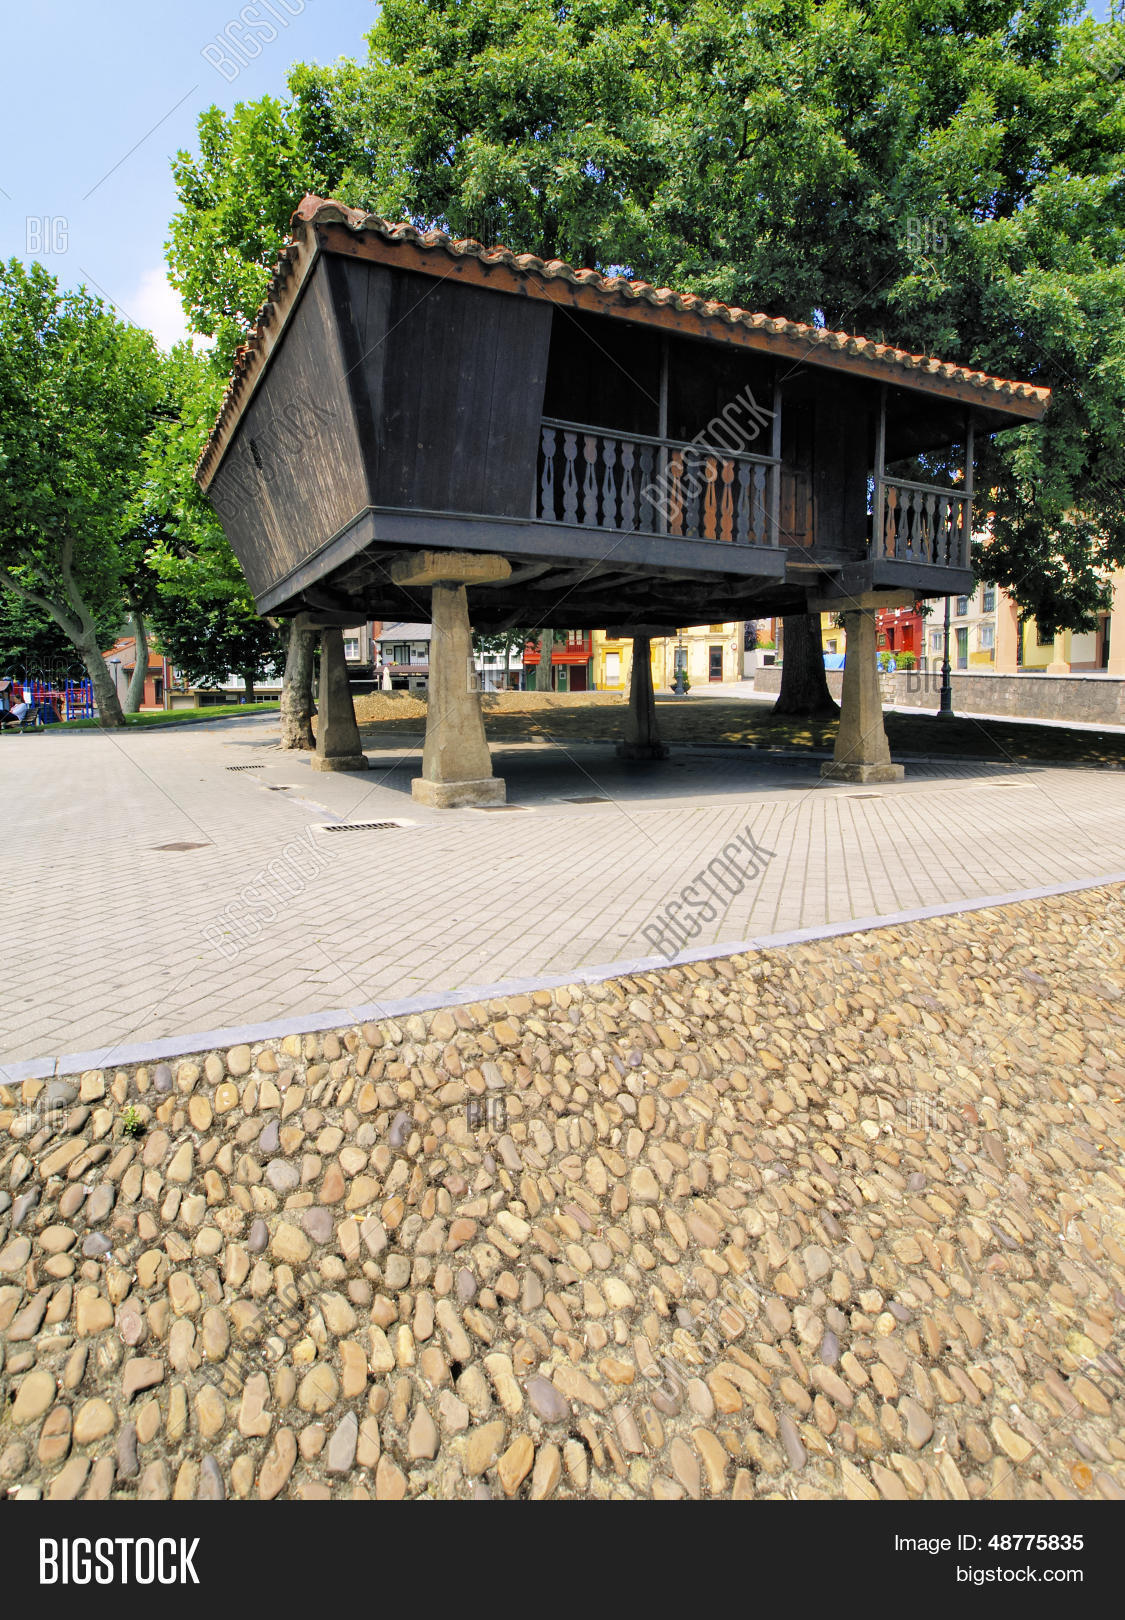 Aviles - beautiful small city in Asturias Region northen Spain.